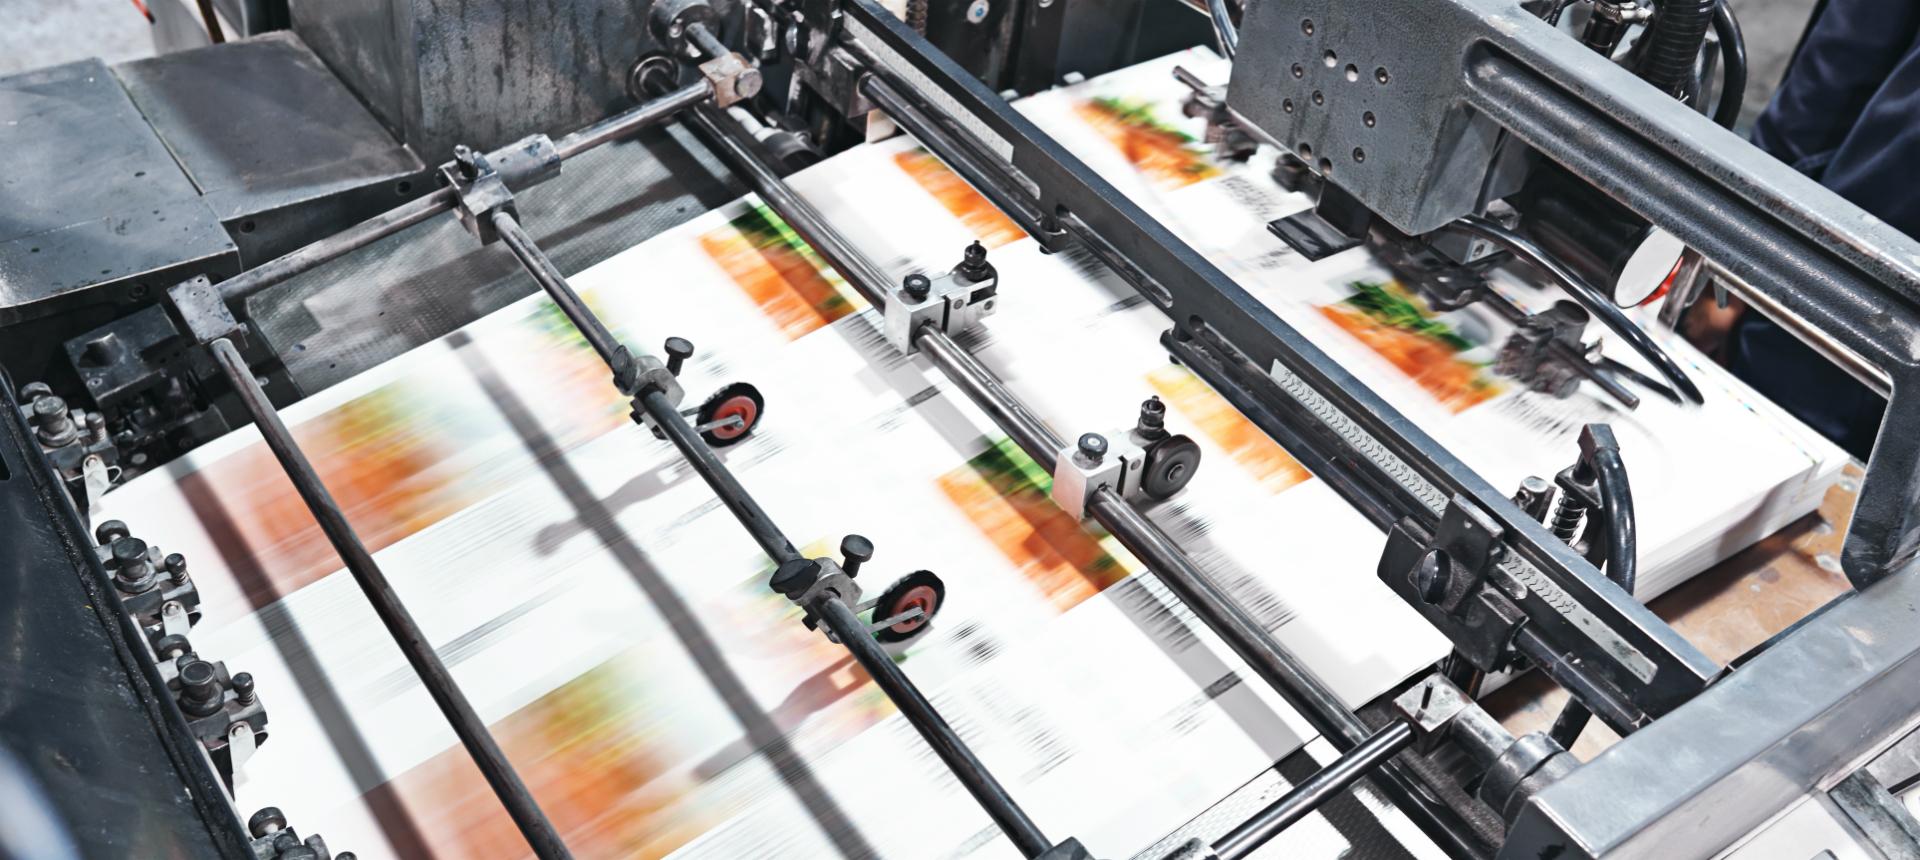 Image of print press